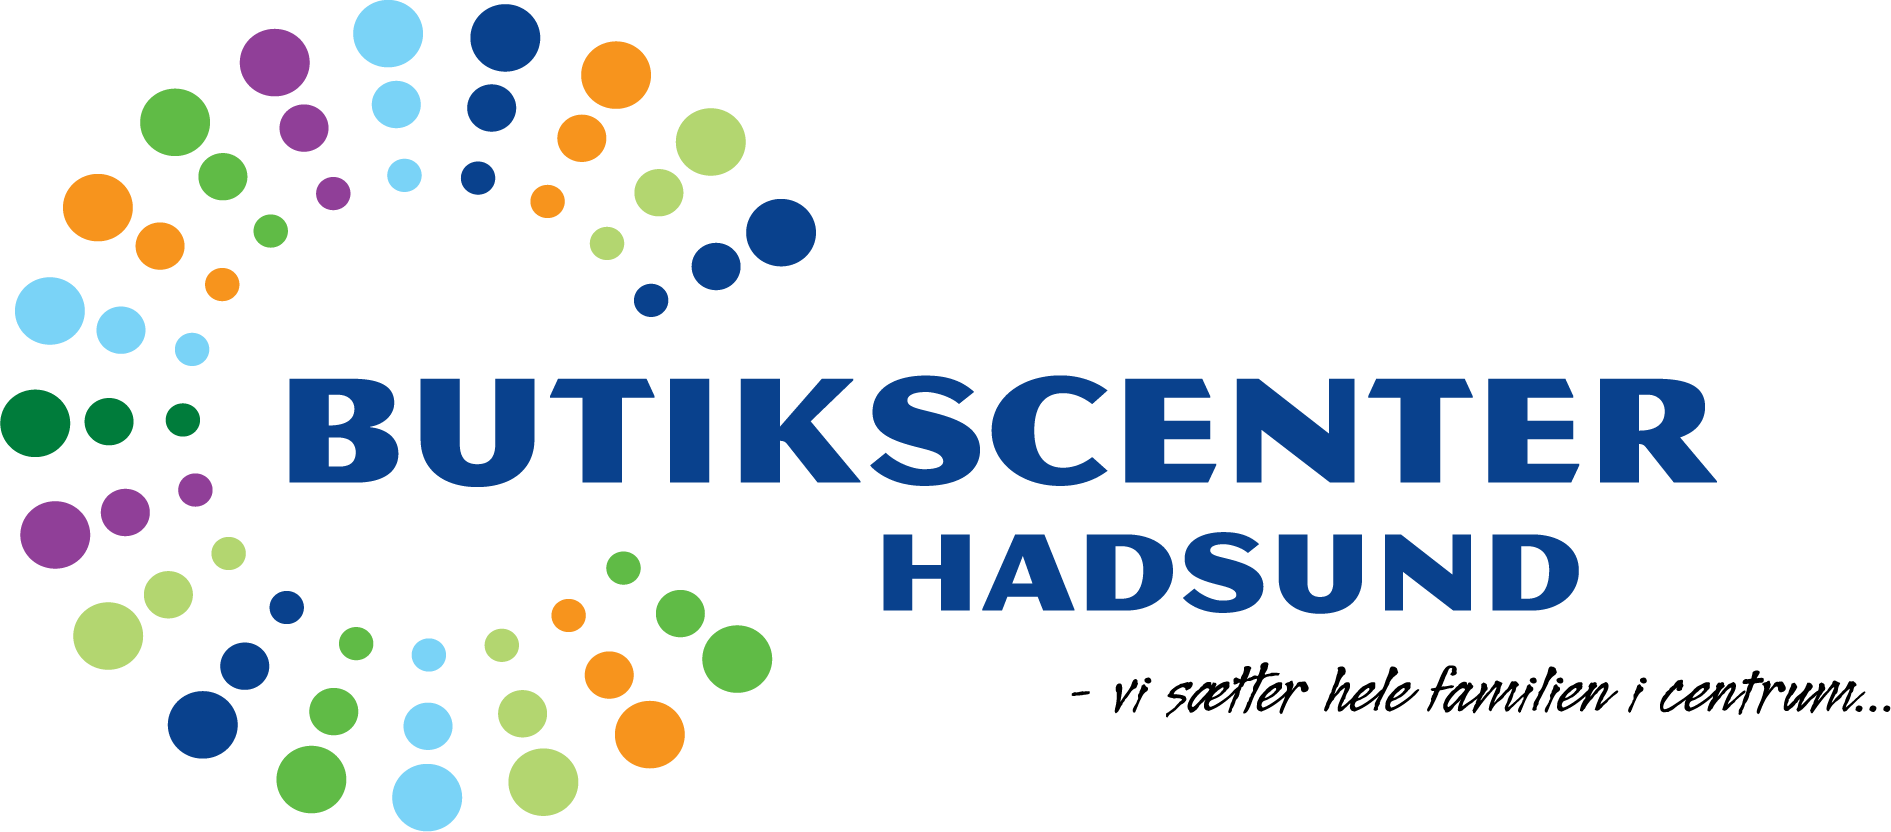 butikscenter hadsund logo